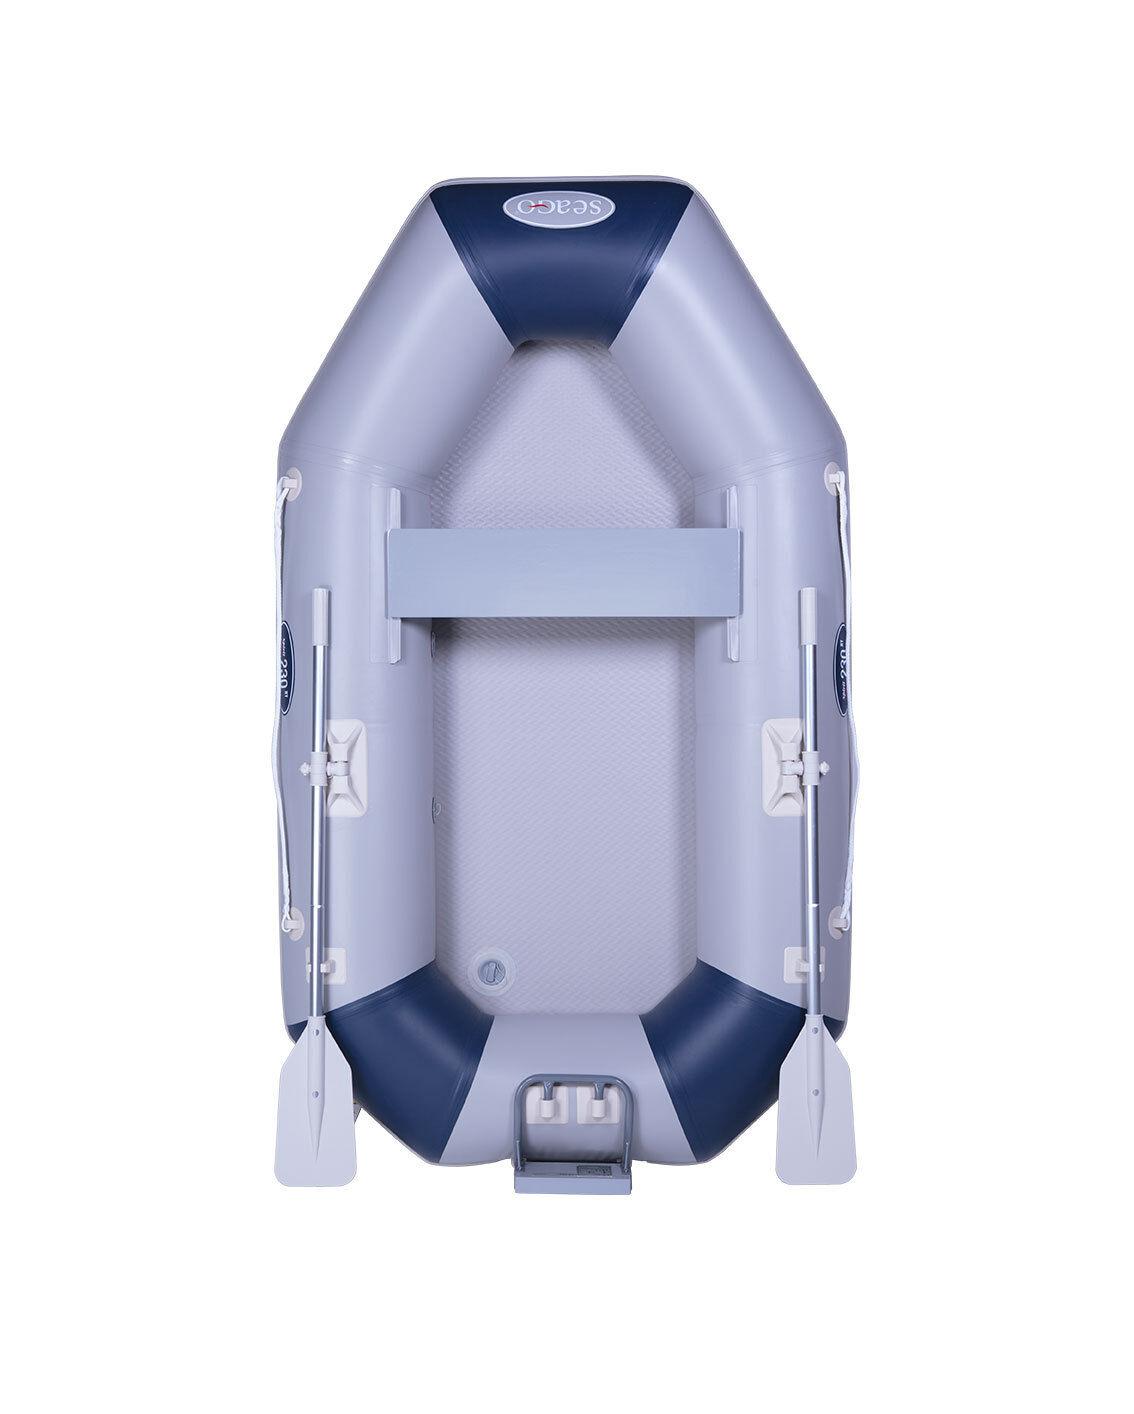 Seago Inflatable Dinghy tender Spirit 230RT